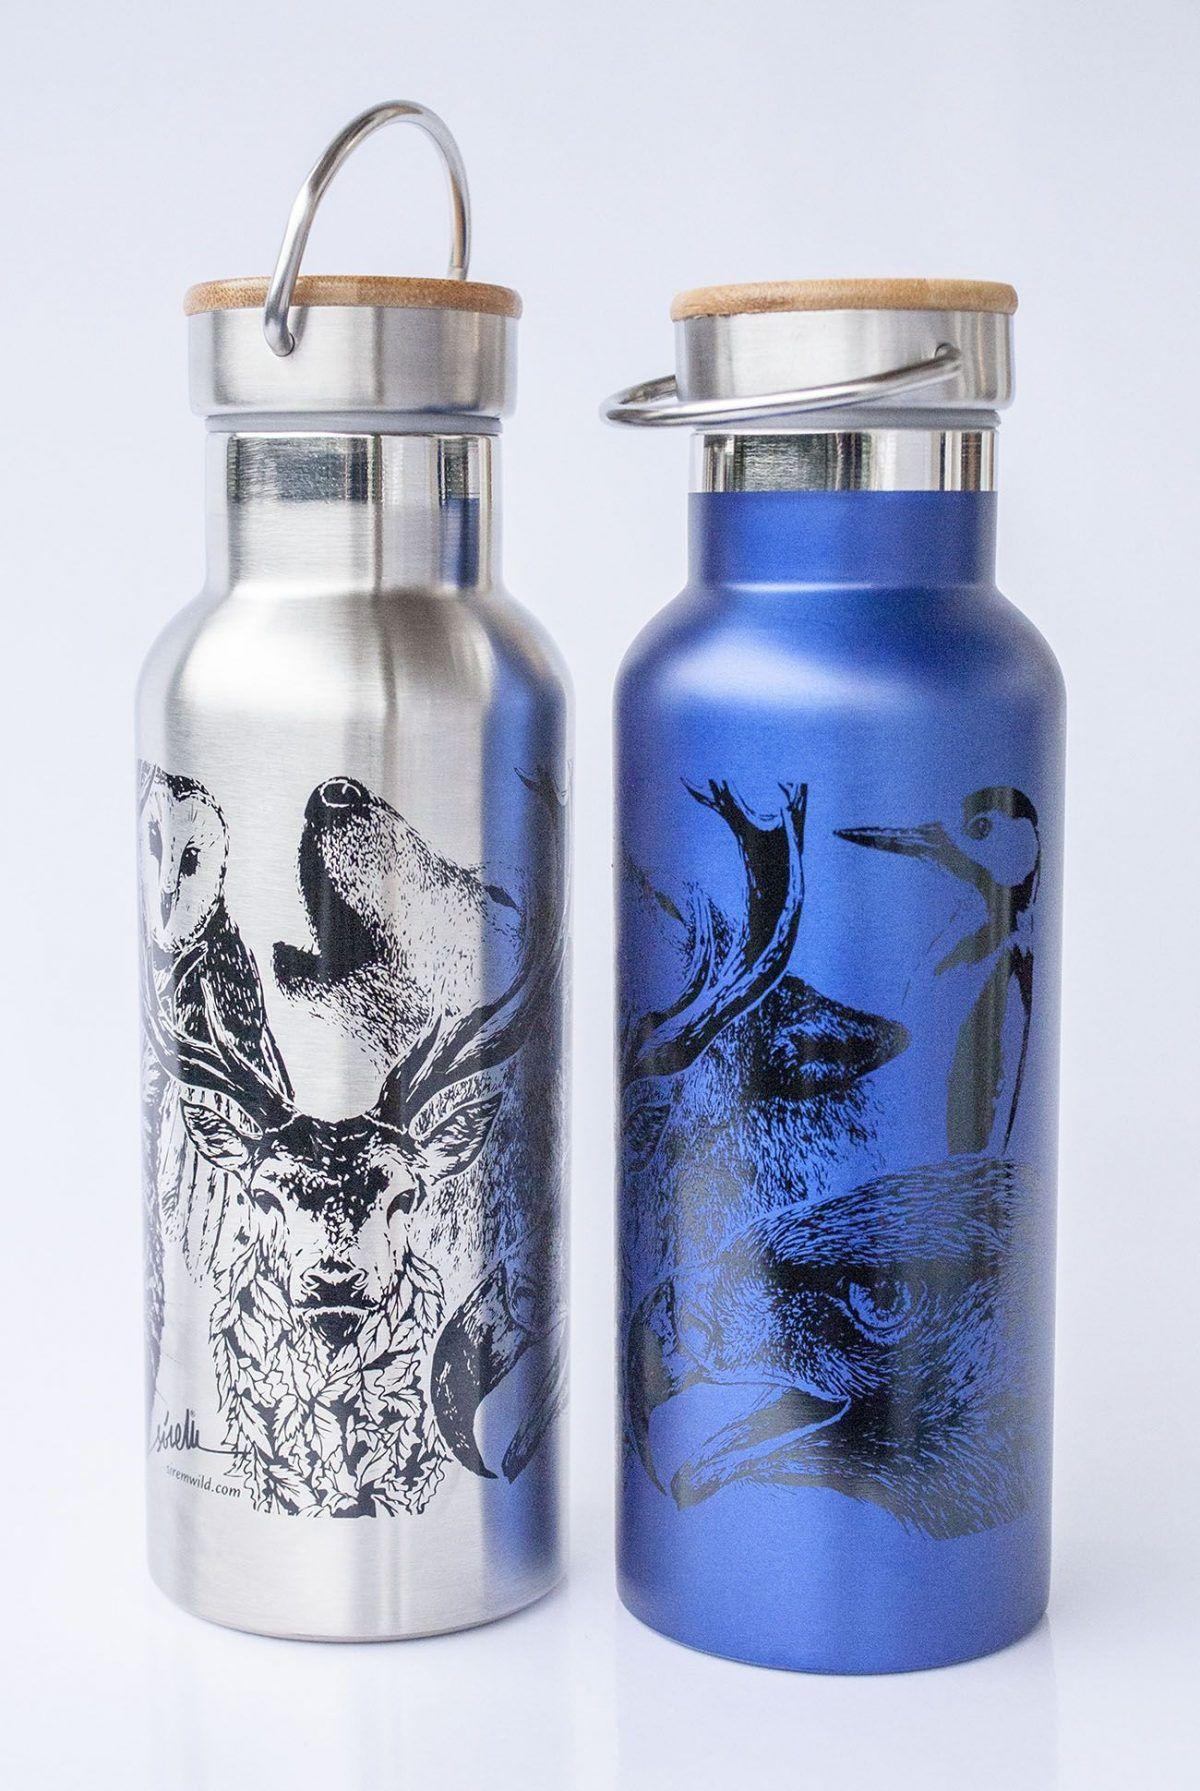 botella termo reutilizable-acero inoxidable-500ml-dibujos animales-zero waste-plata-azul